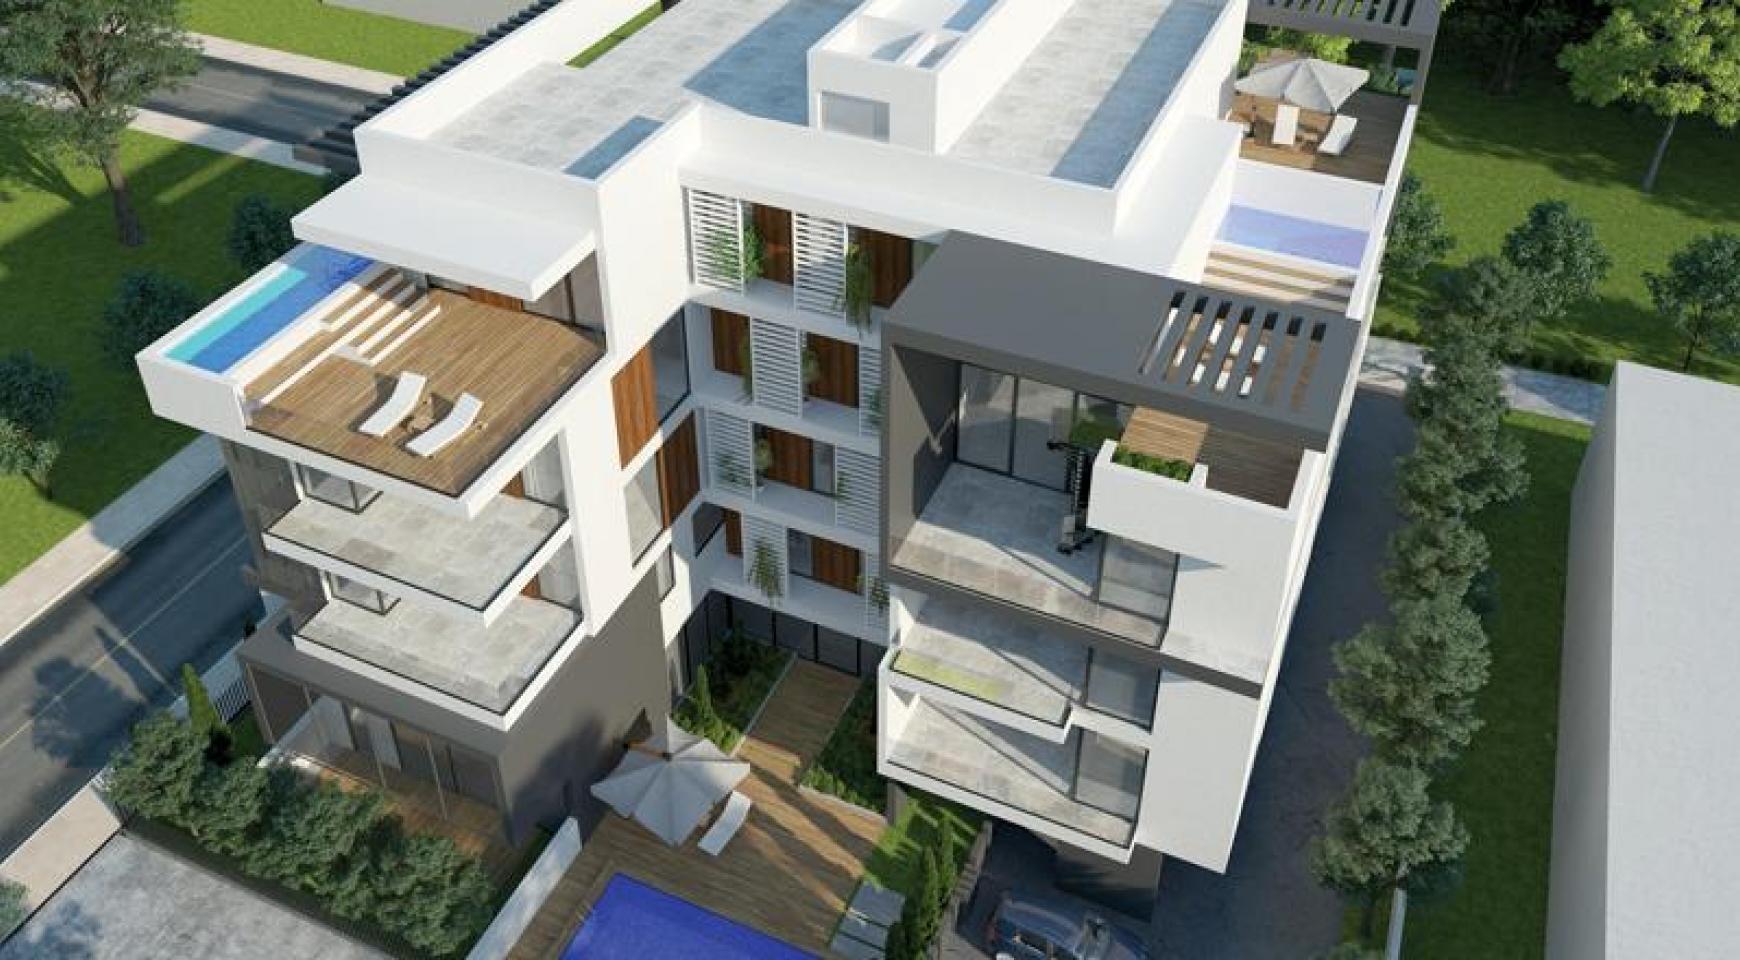 New 2 Bedroom Apartment in a Contemporary Complex near the Sea - 1